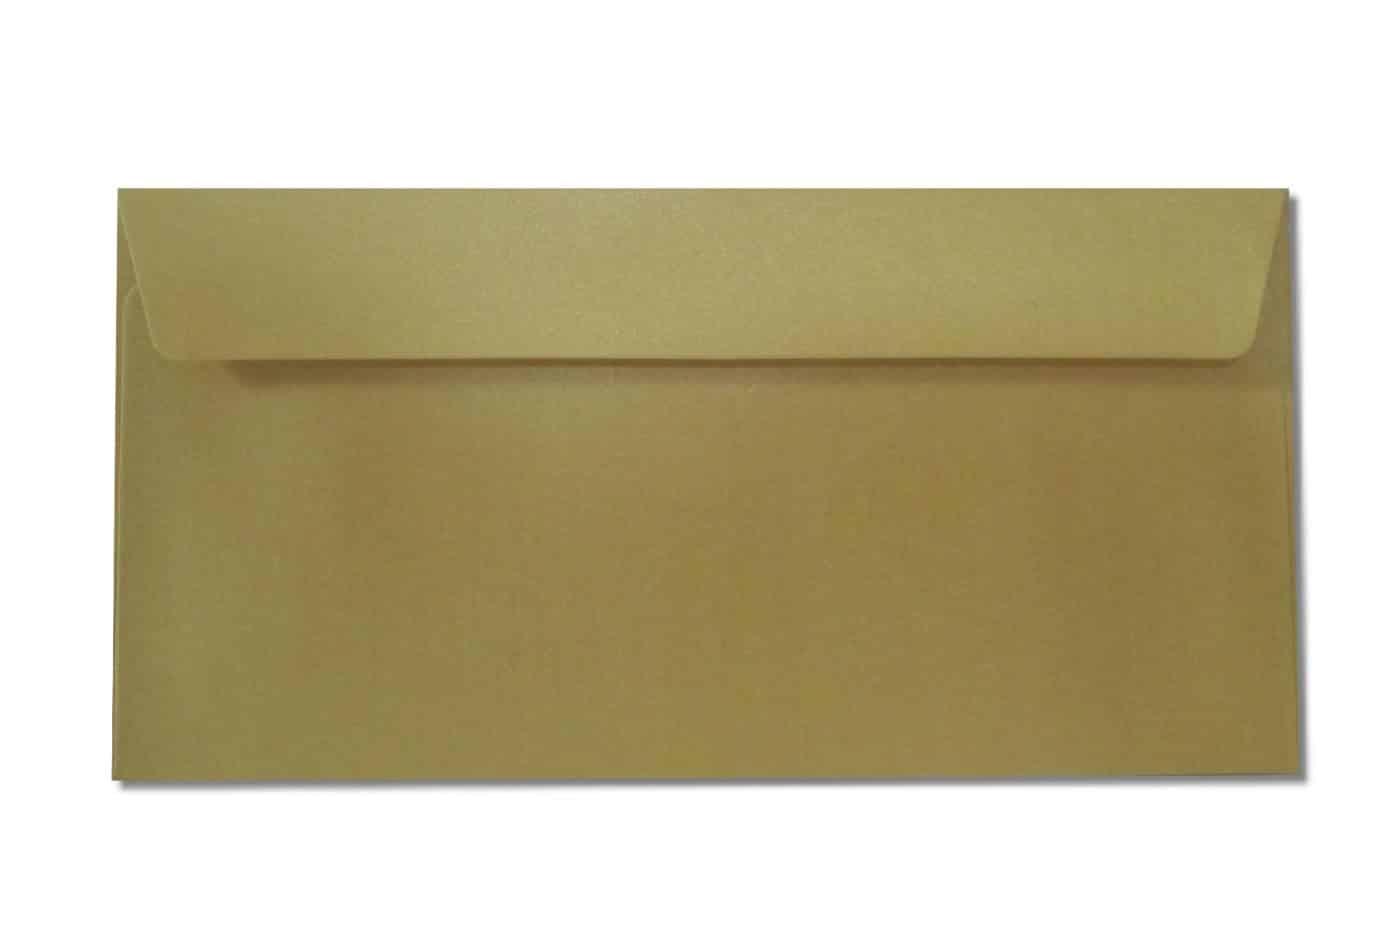 DL metallic envelopes